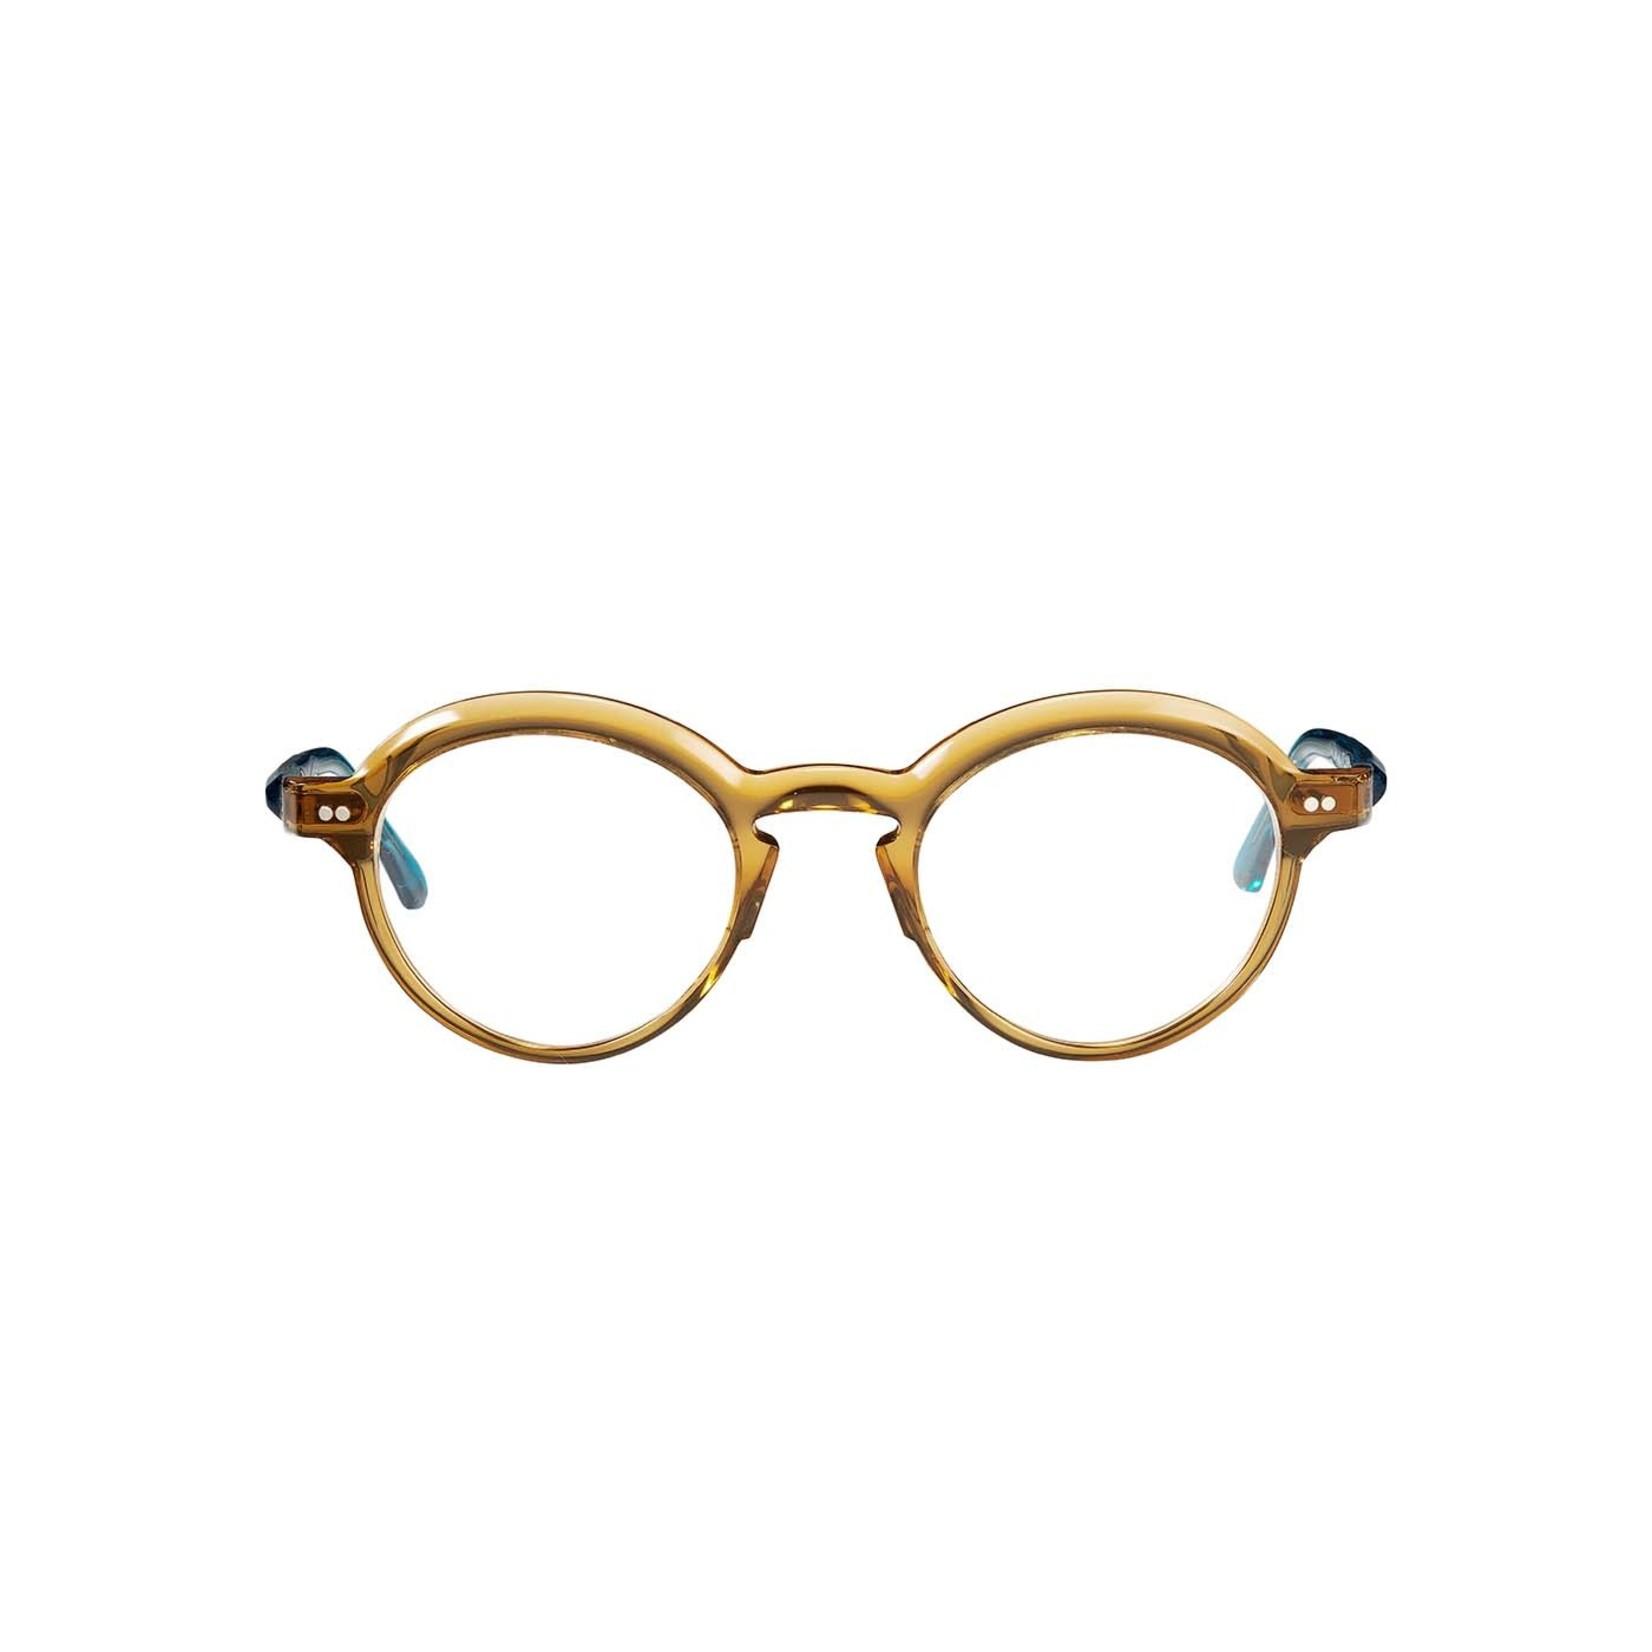 Matttew Matttew Lalique